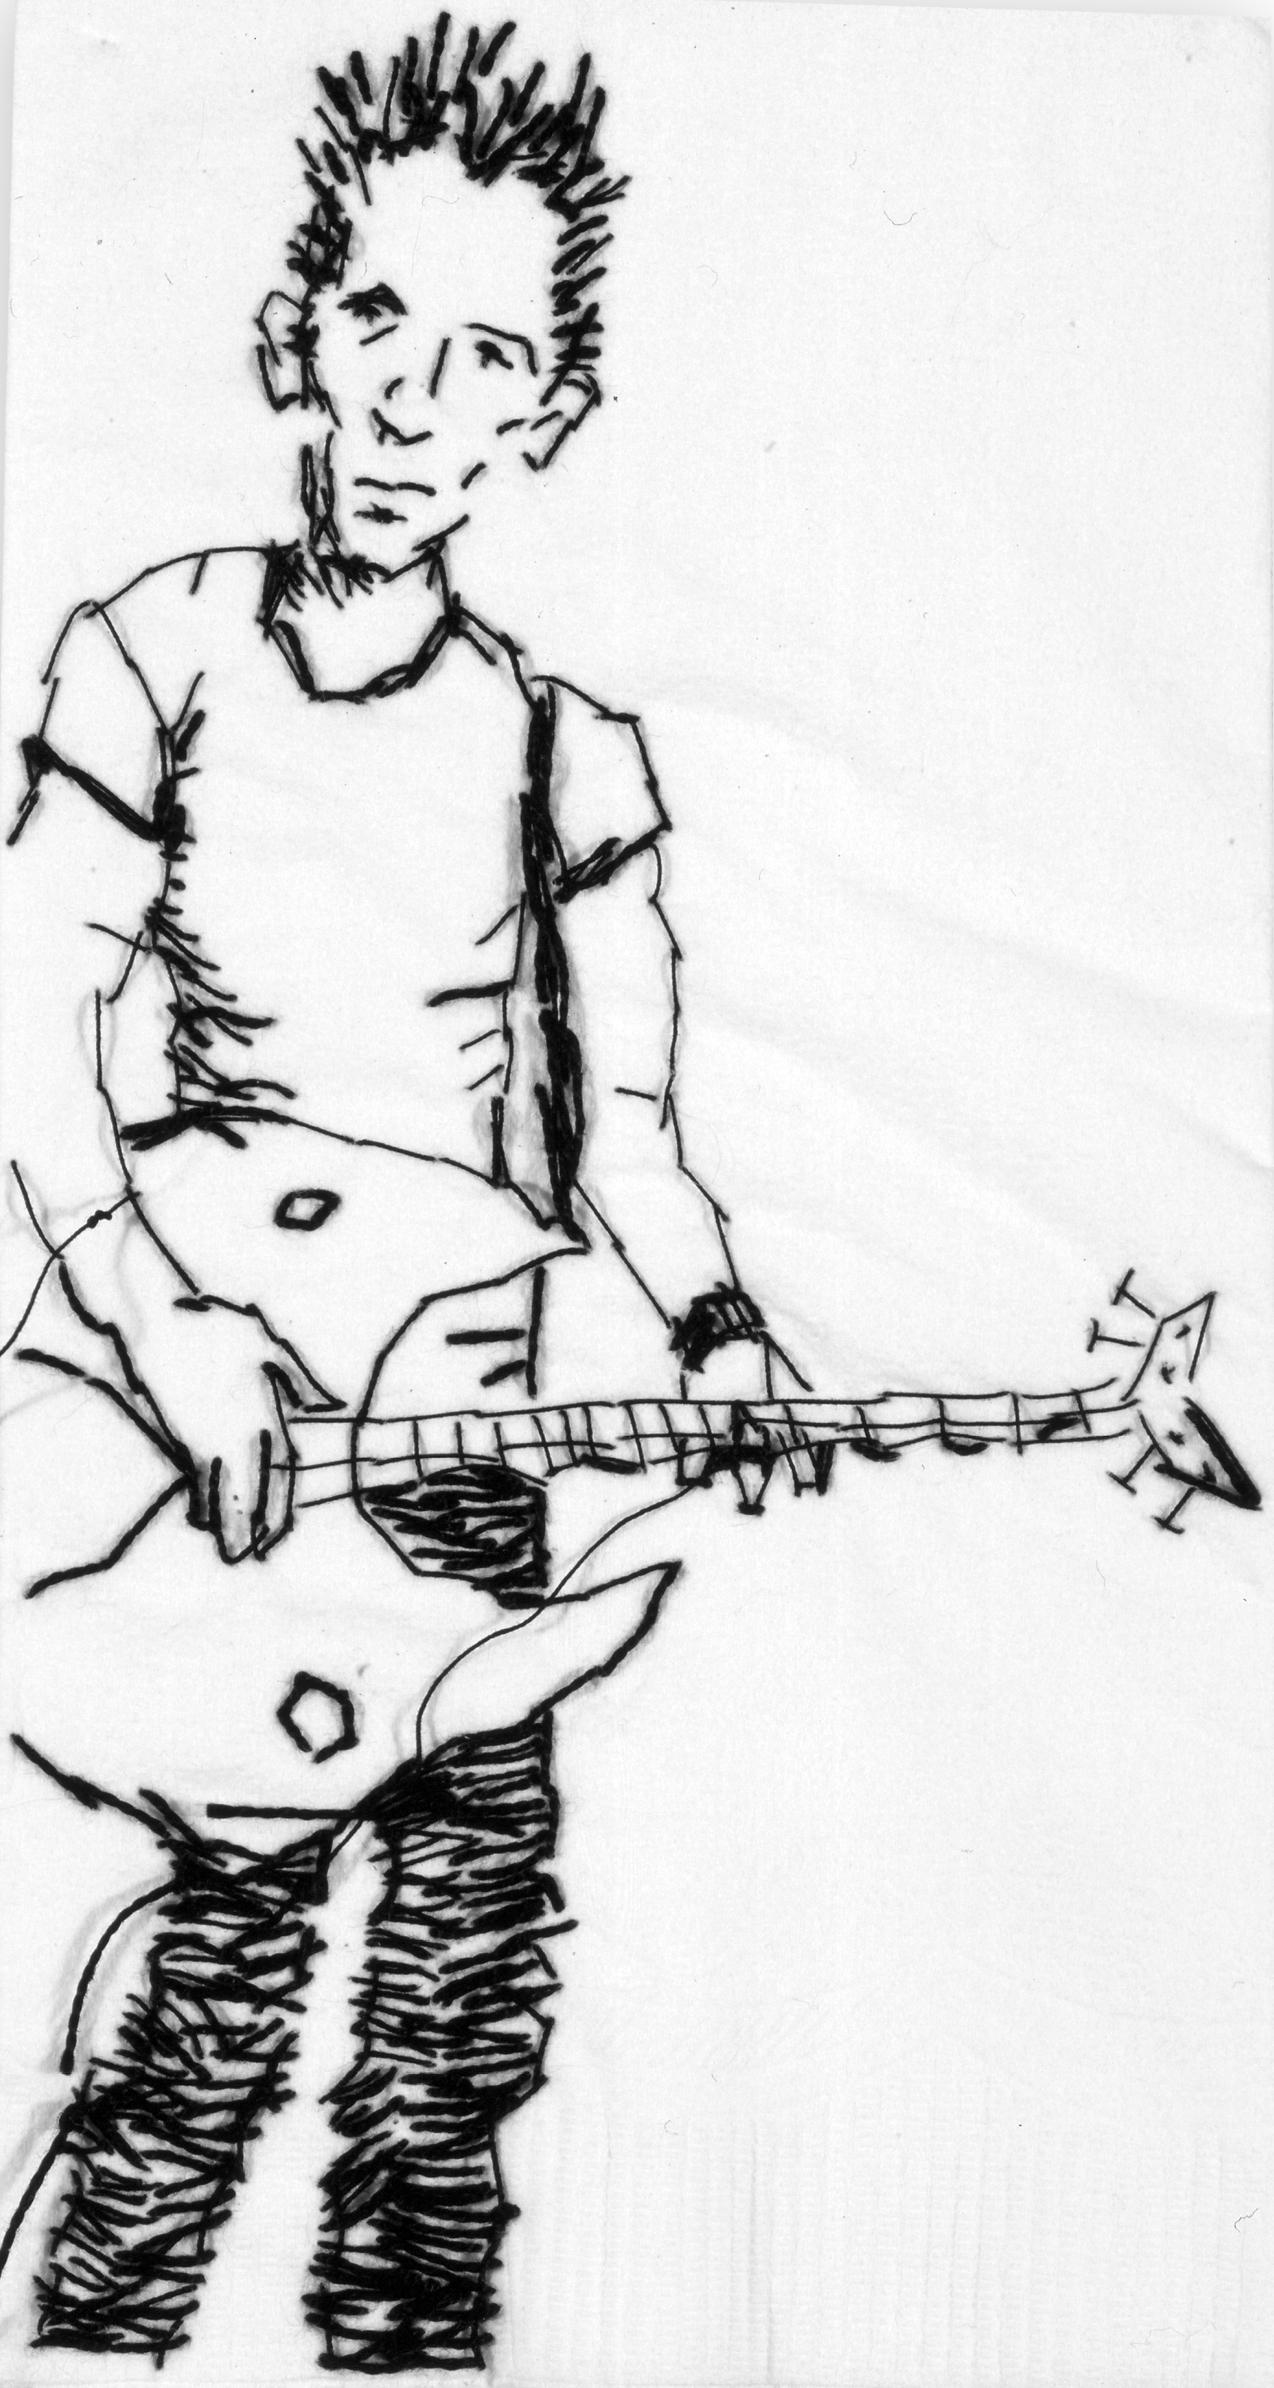 "Jason  Black thread on paper napkin, 7"" x 4"", 2005"